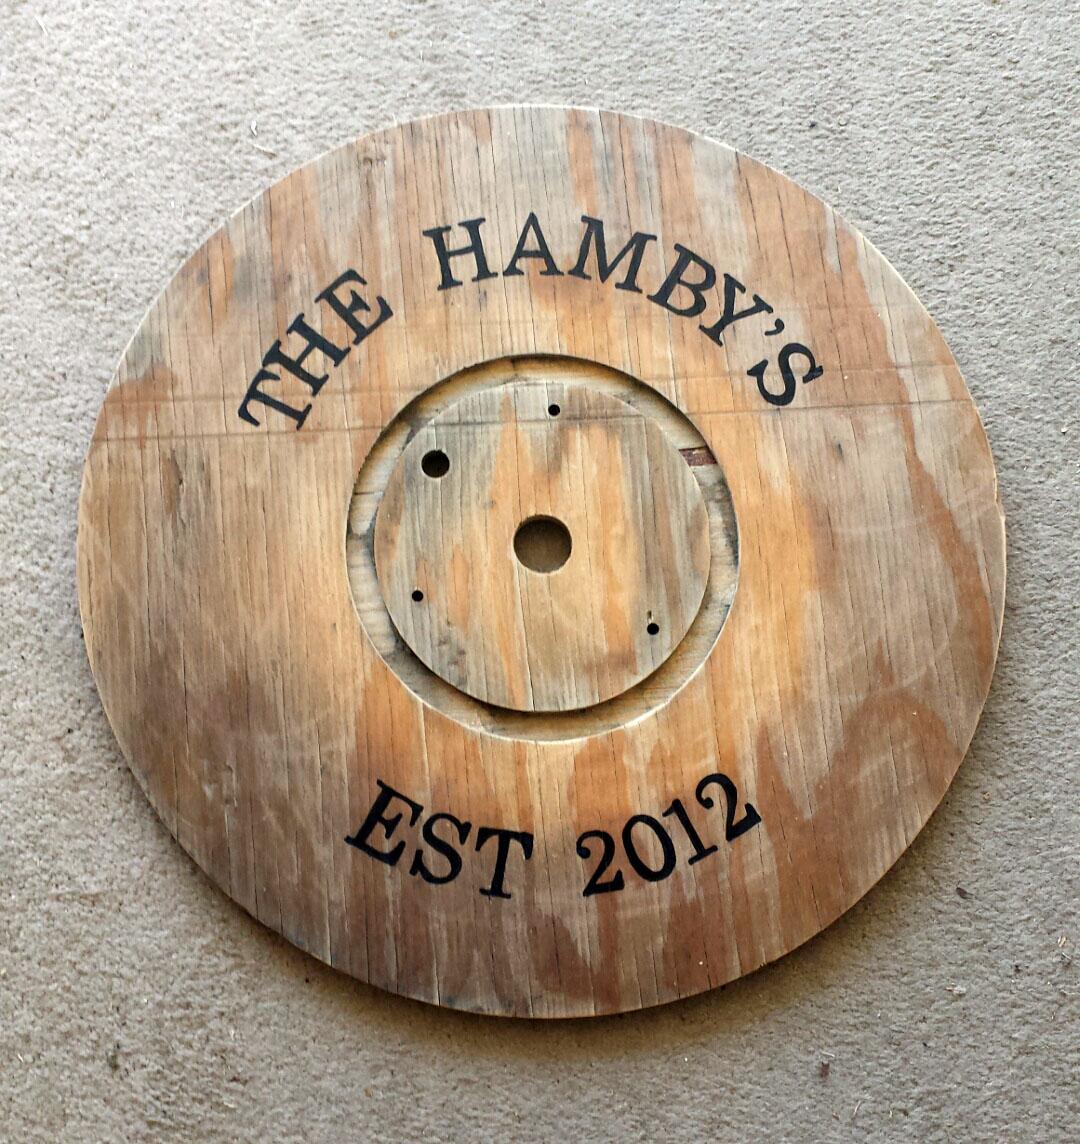 Diy Wooden Spool Tray The Hamby Home